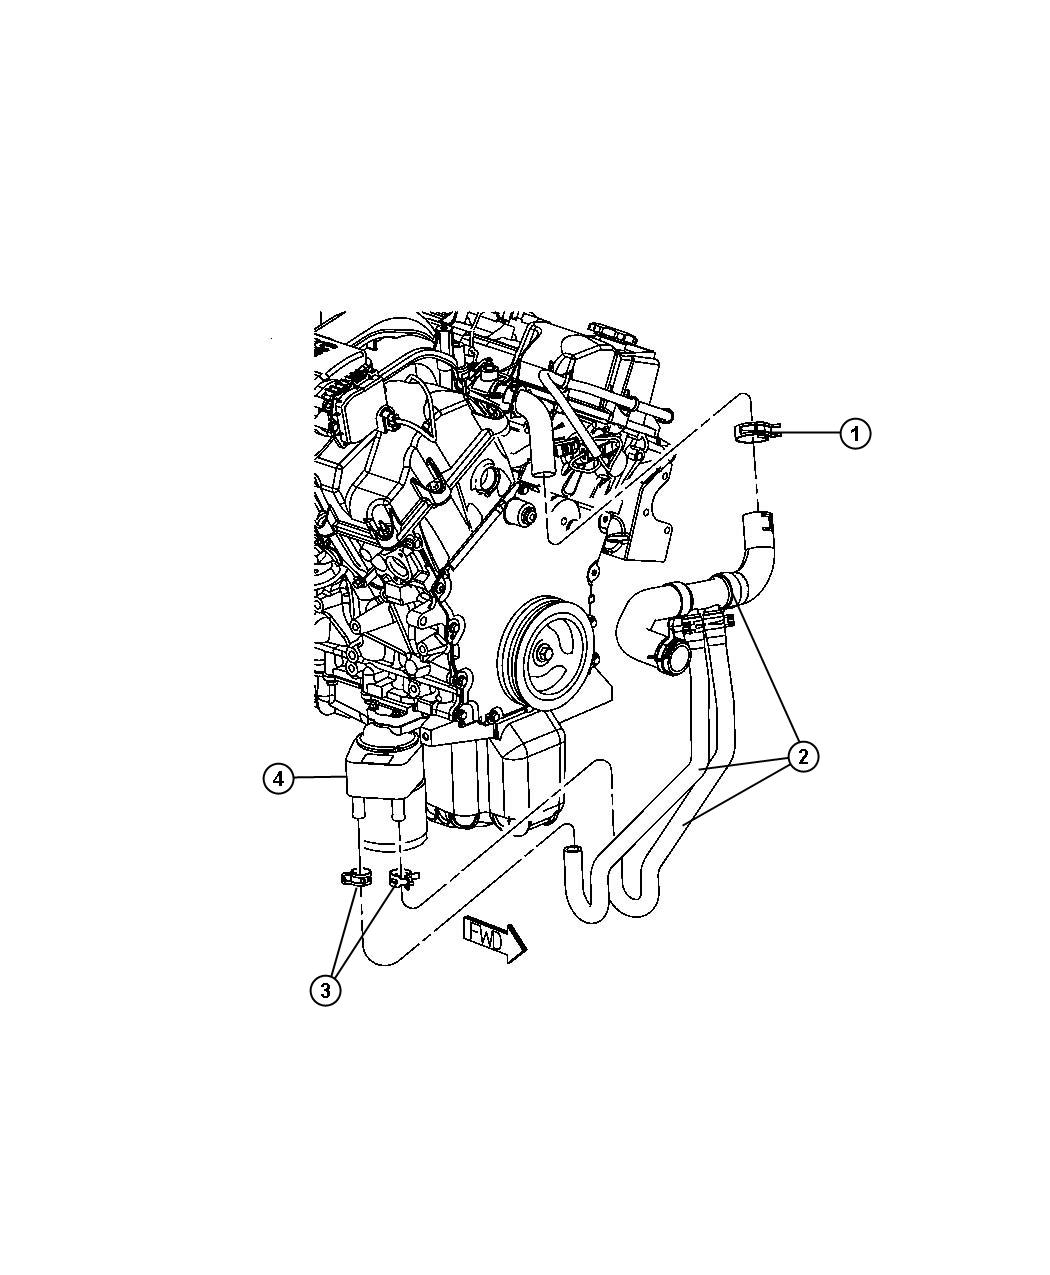 Chrysler 300 Clamp By Pass Hose 38x15 40x15 Radiator